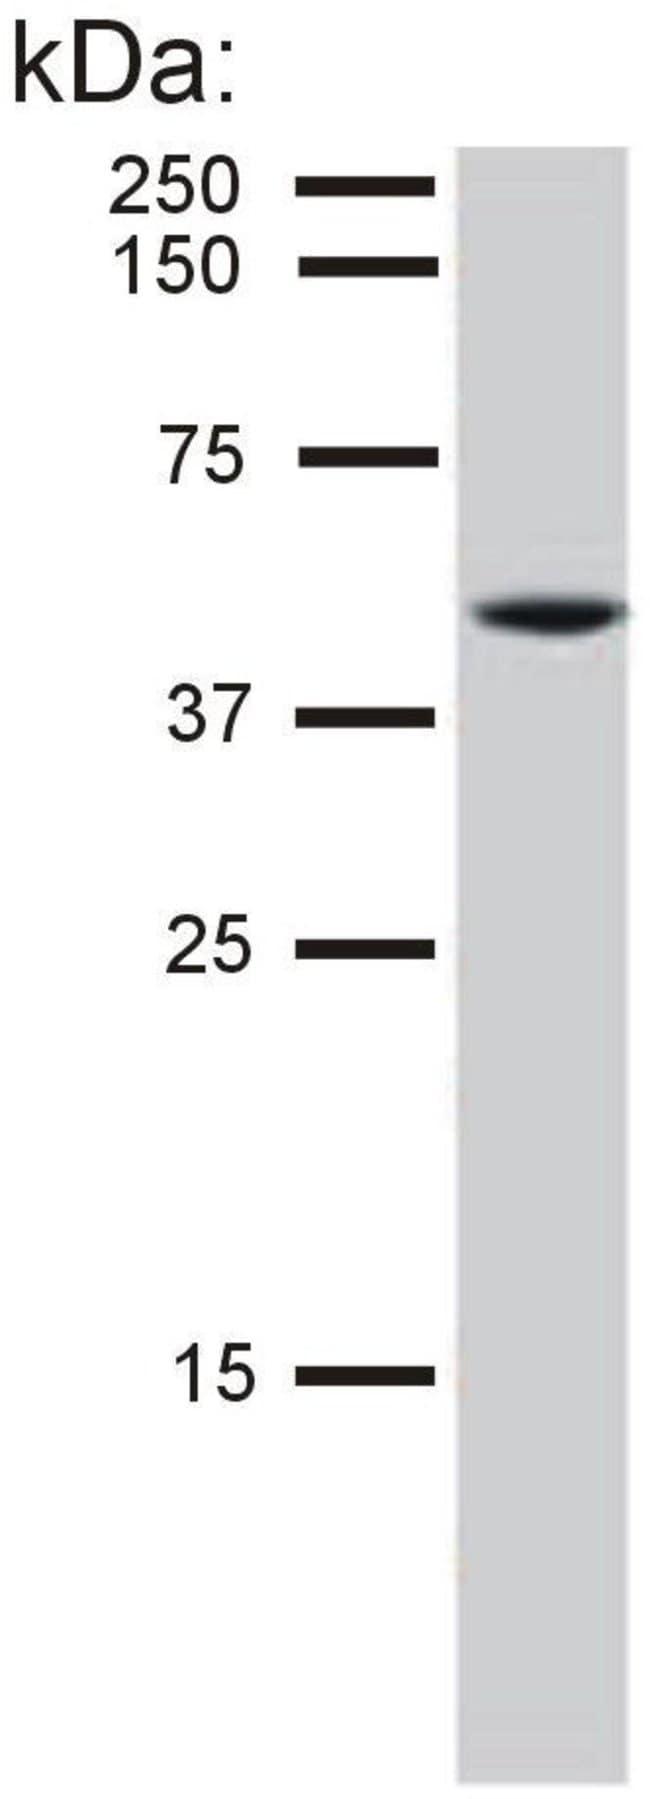 Cytokeratin 8 Mouse anti-Bovine, Human, Ovine, Porcine, Clone: C-51, Invitrogen